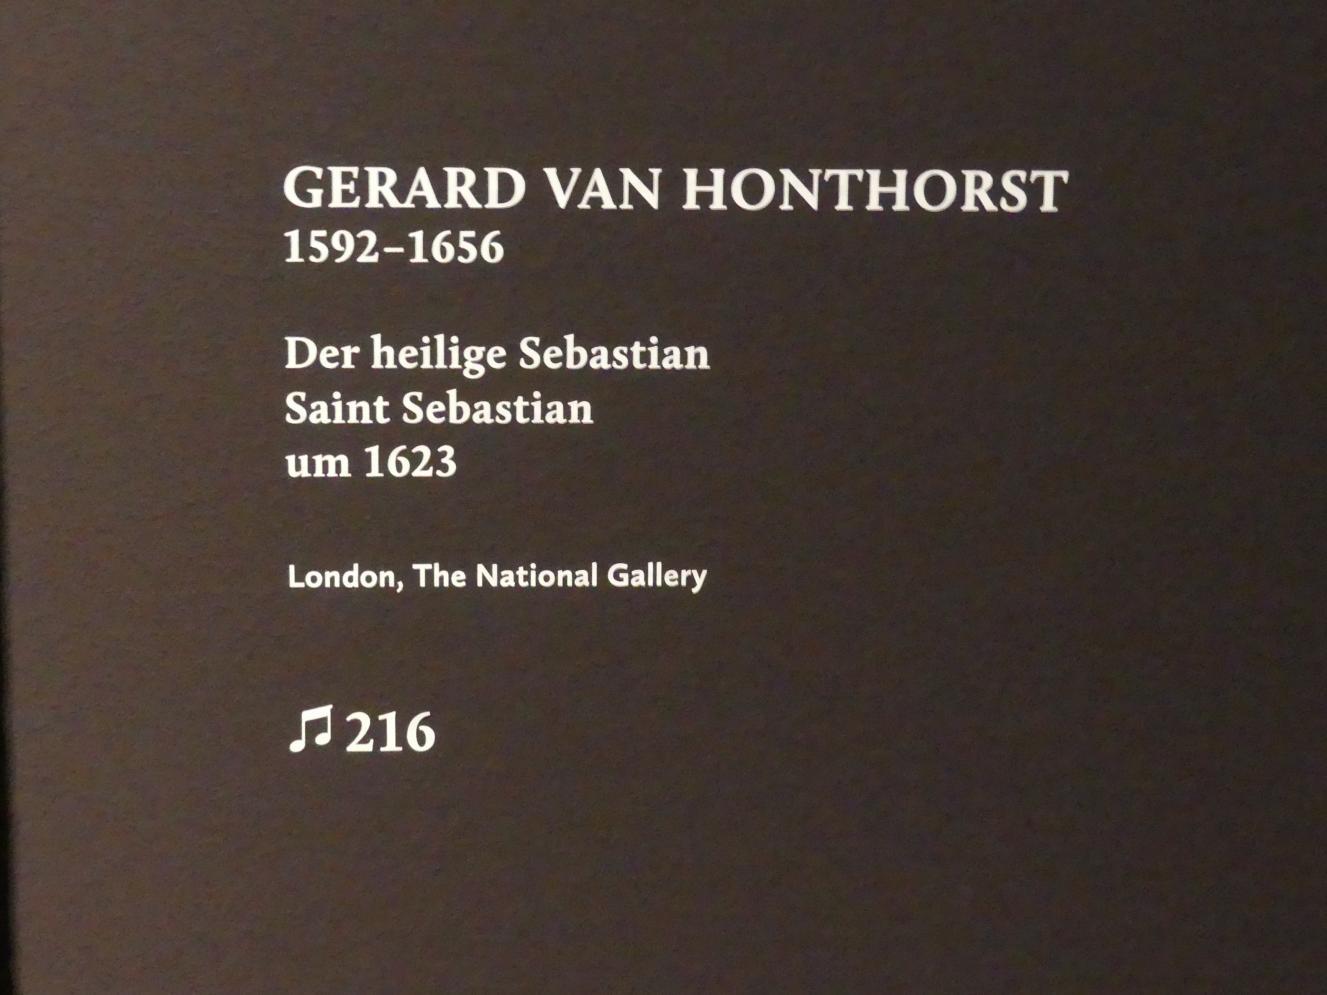 Gerrit van Honthorst (Gerard van Honthorst): Der heilige Sebastian, um 1623, Bild 2/2